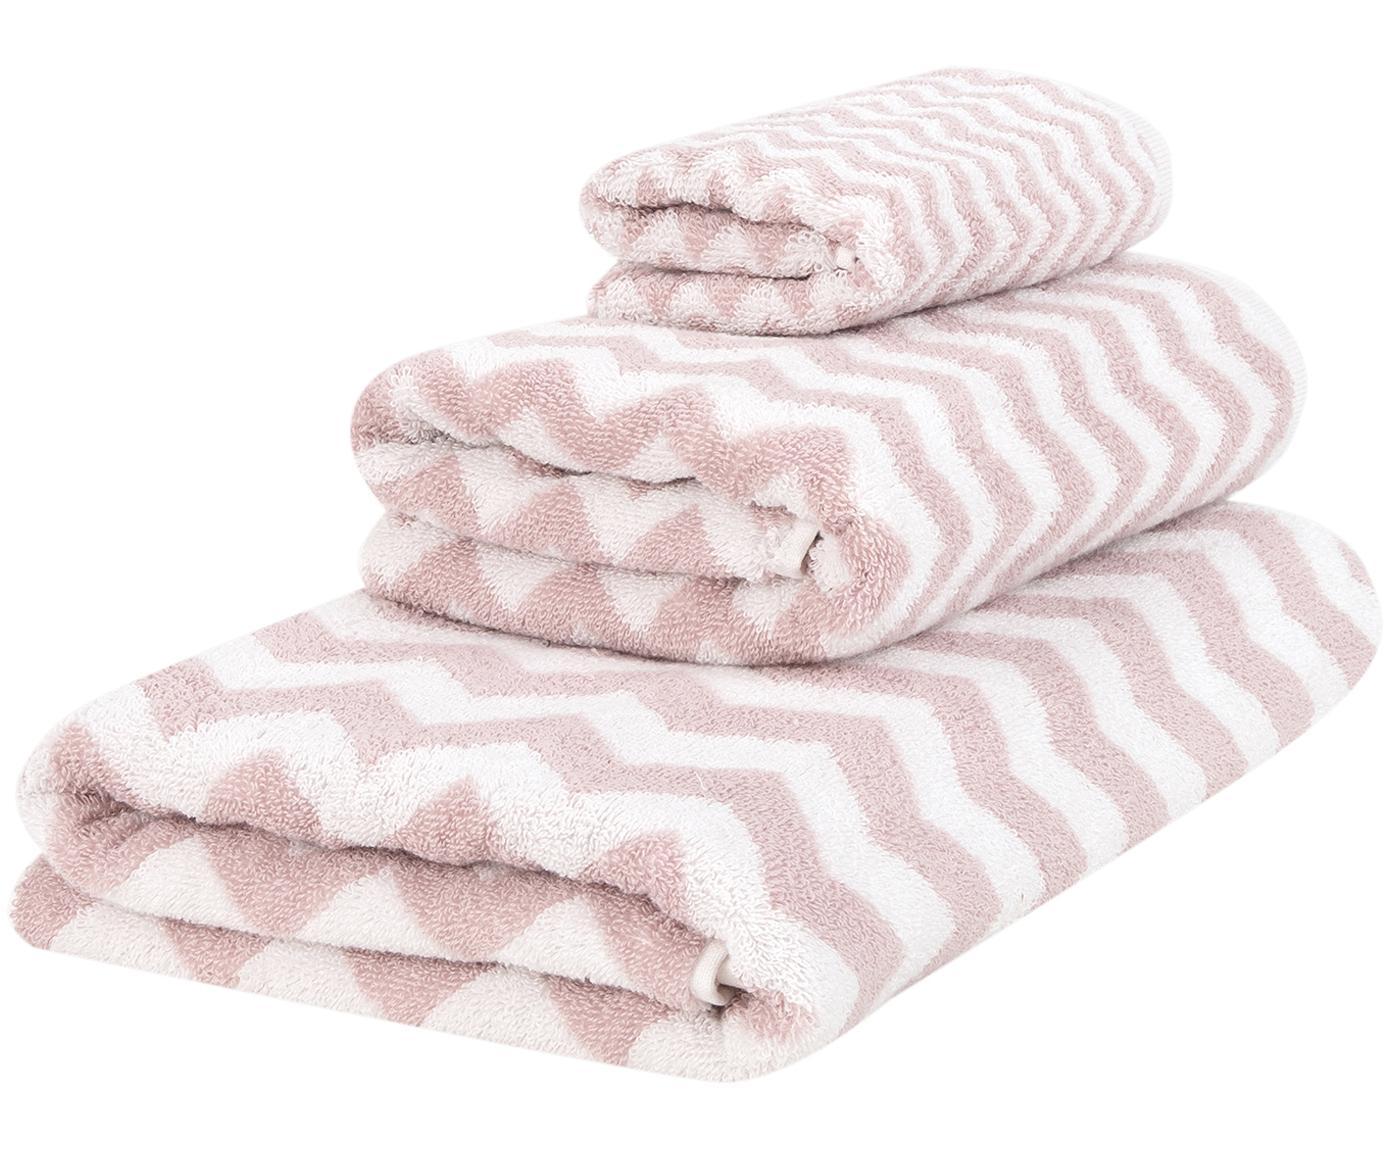 Set de toallas Liv, 3pzas., Rosa, blanco crema, Tamaños diferentes